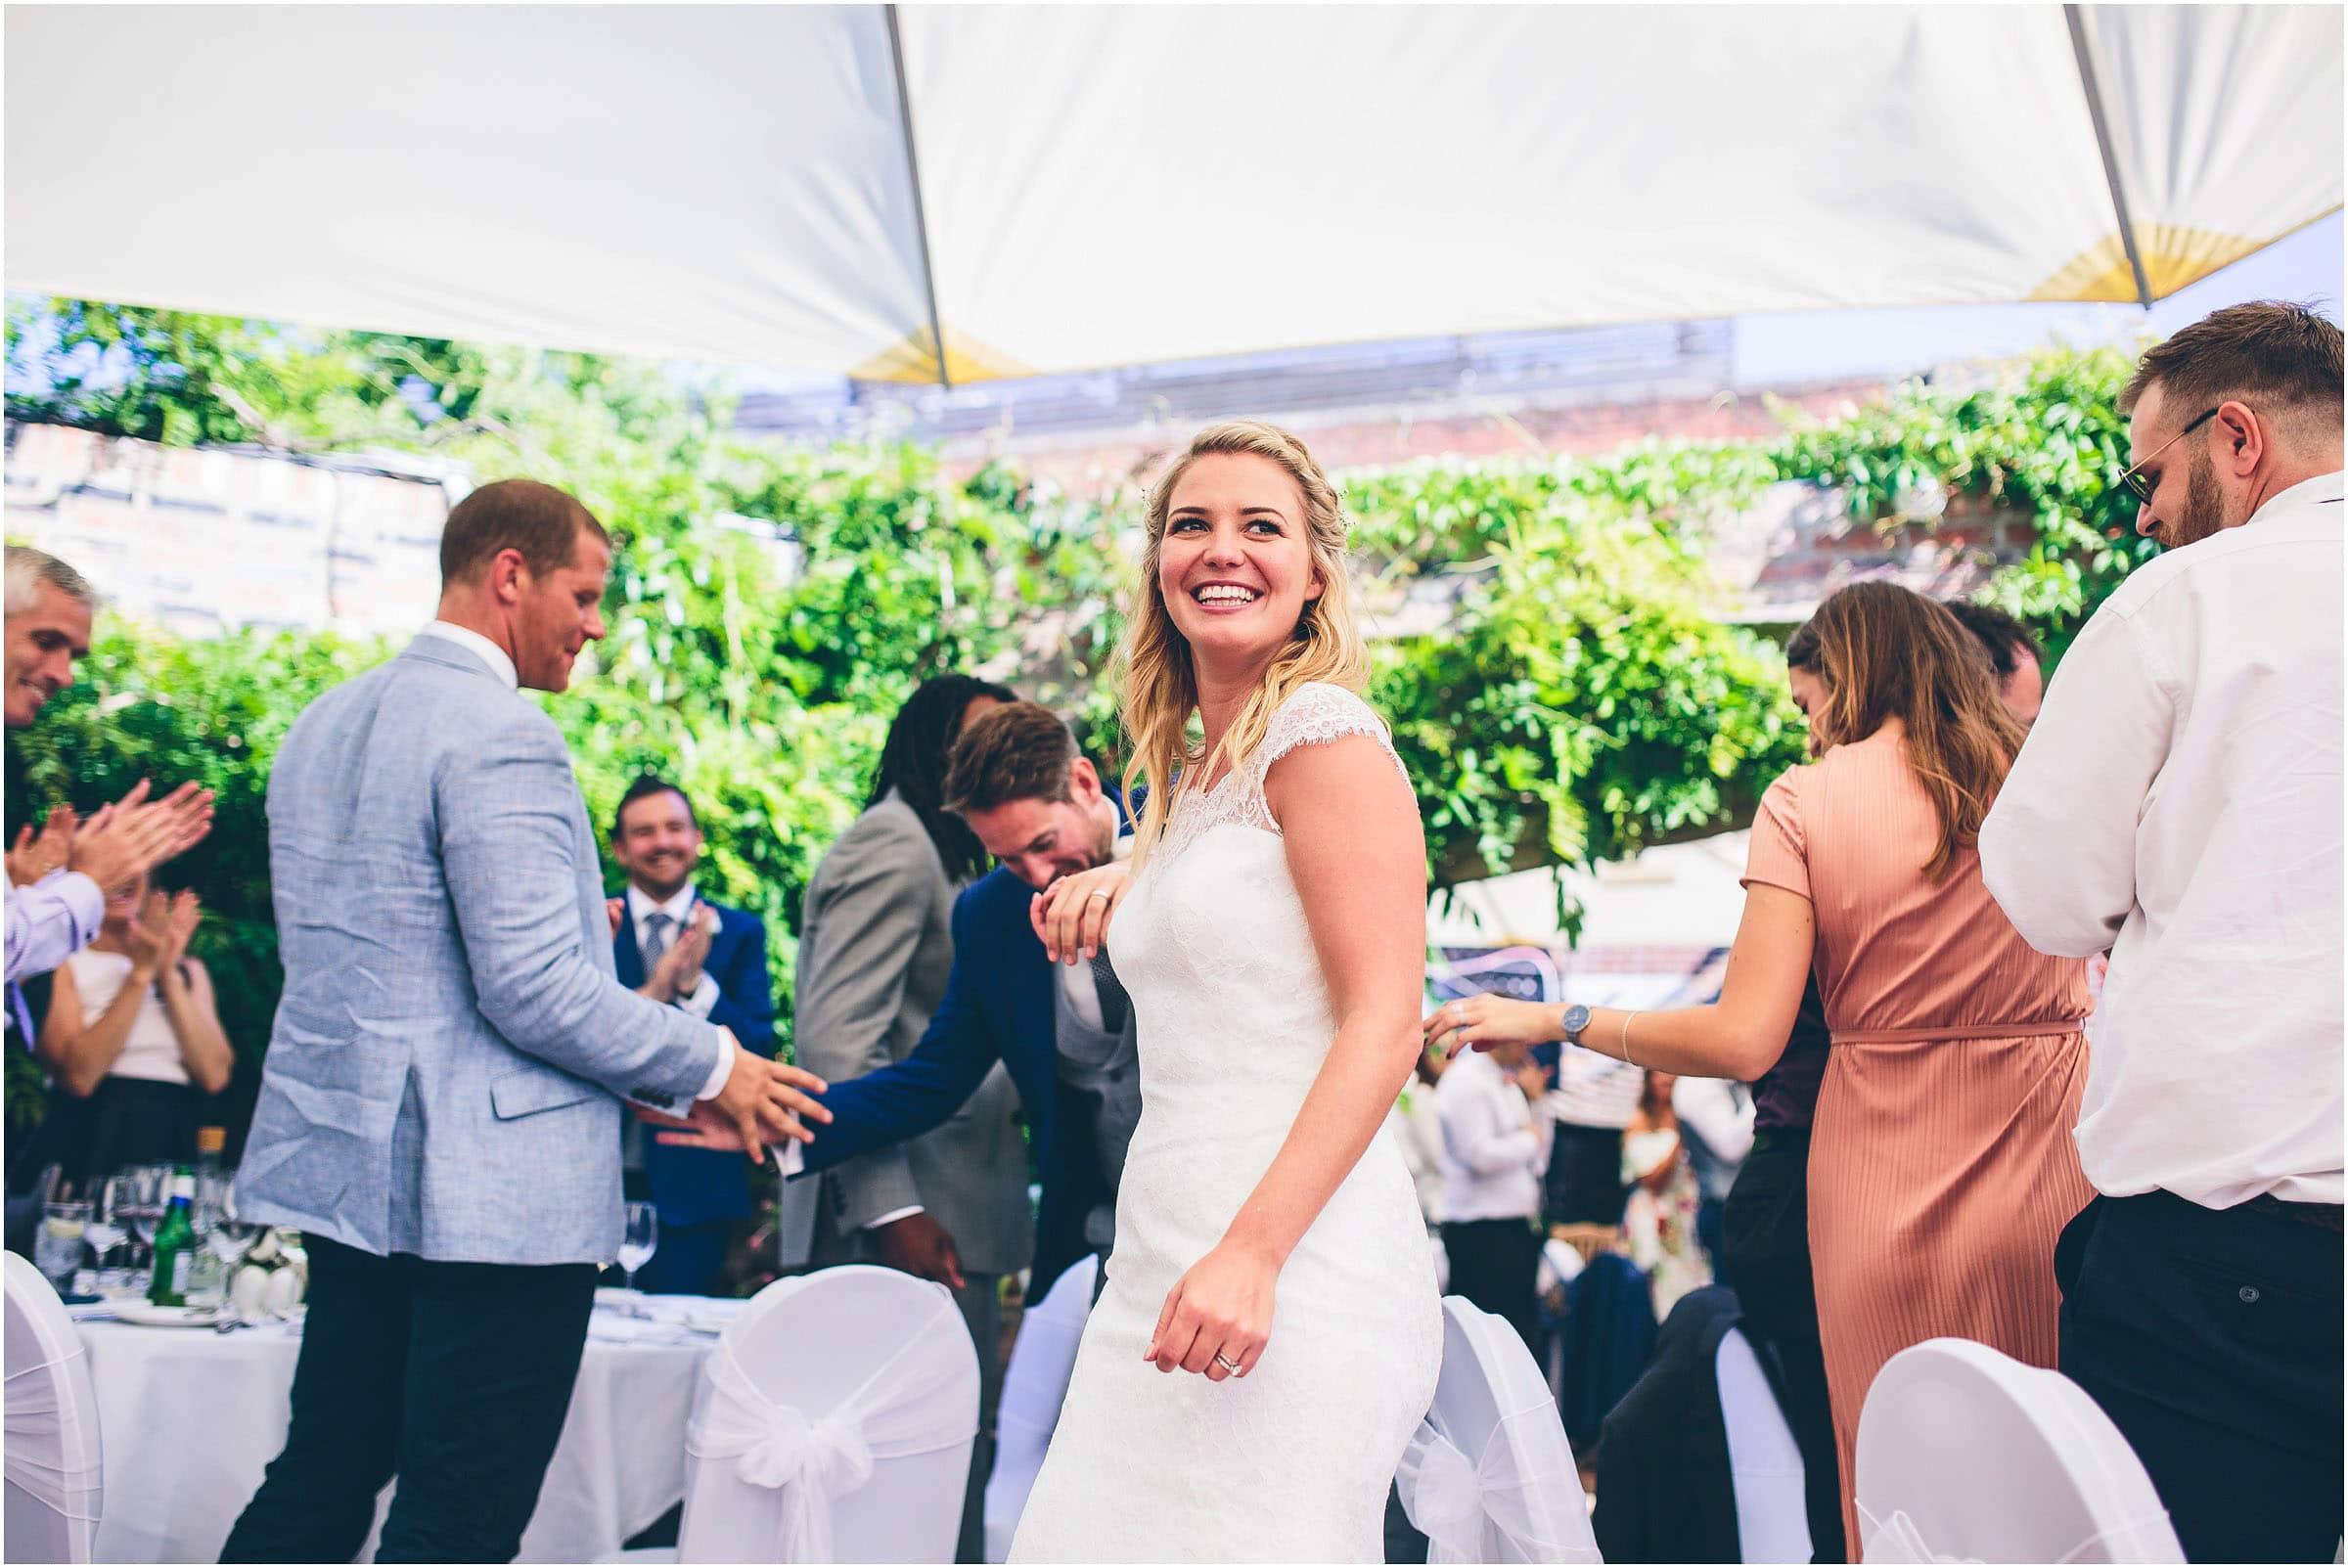 Kensington_Roof_Gardens_Wedding_Photography_0081